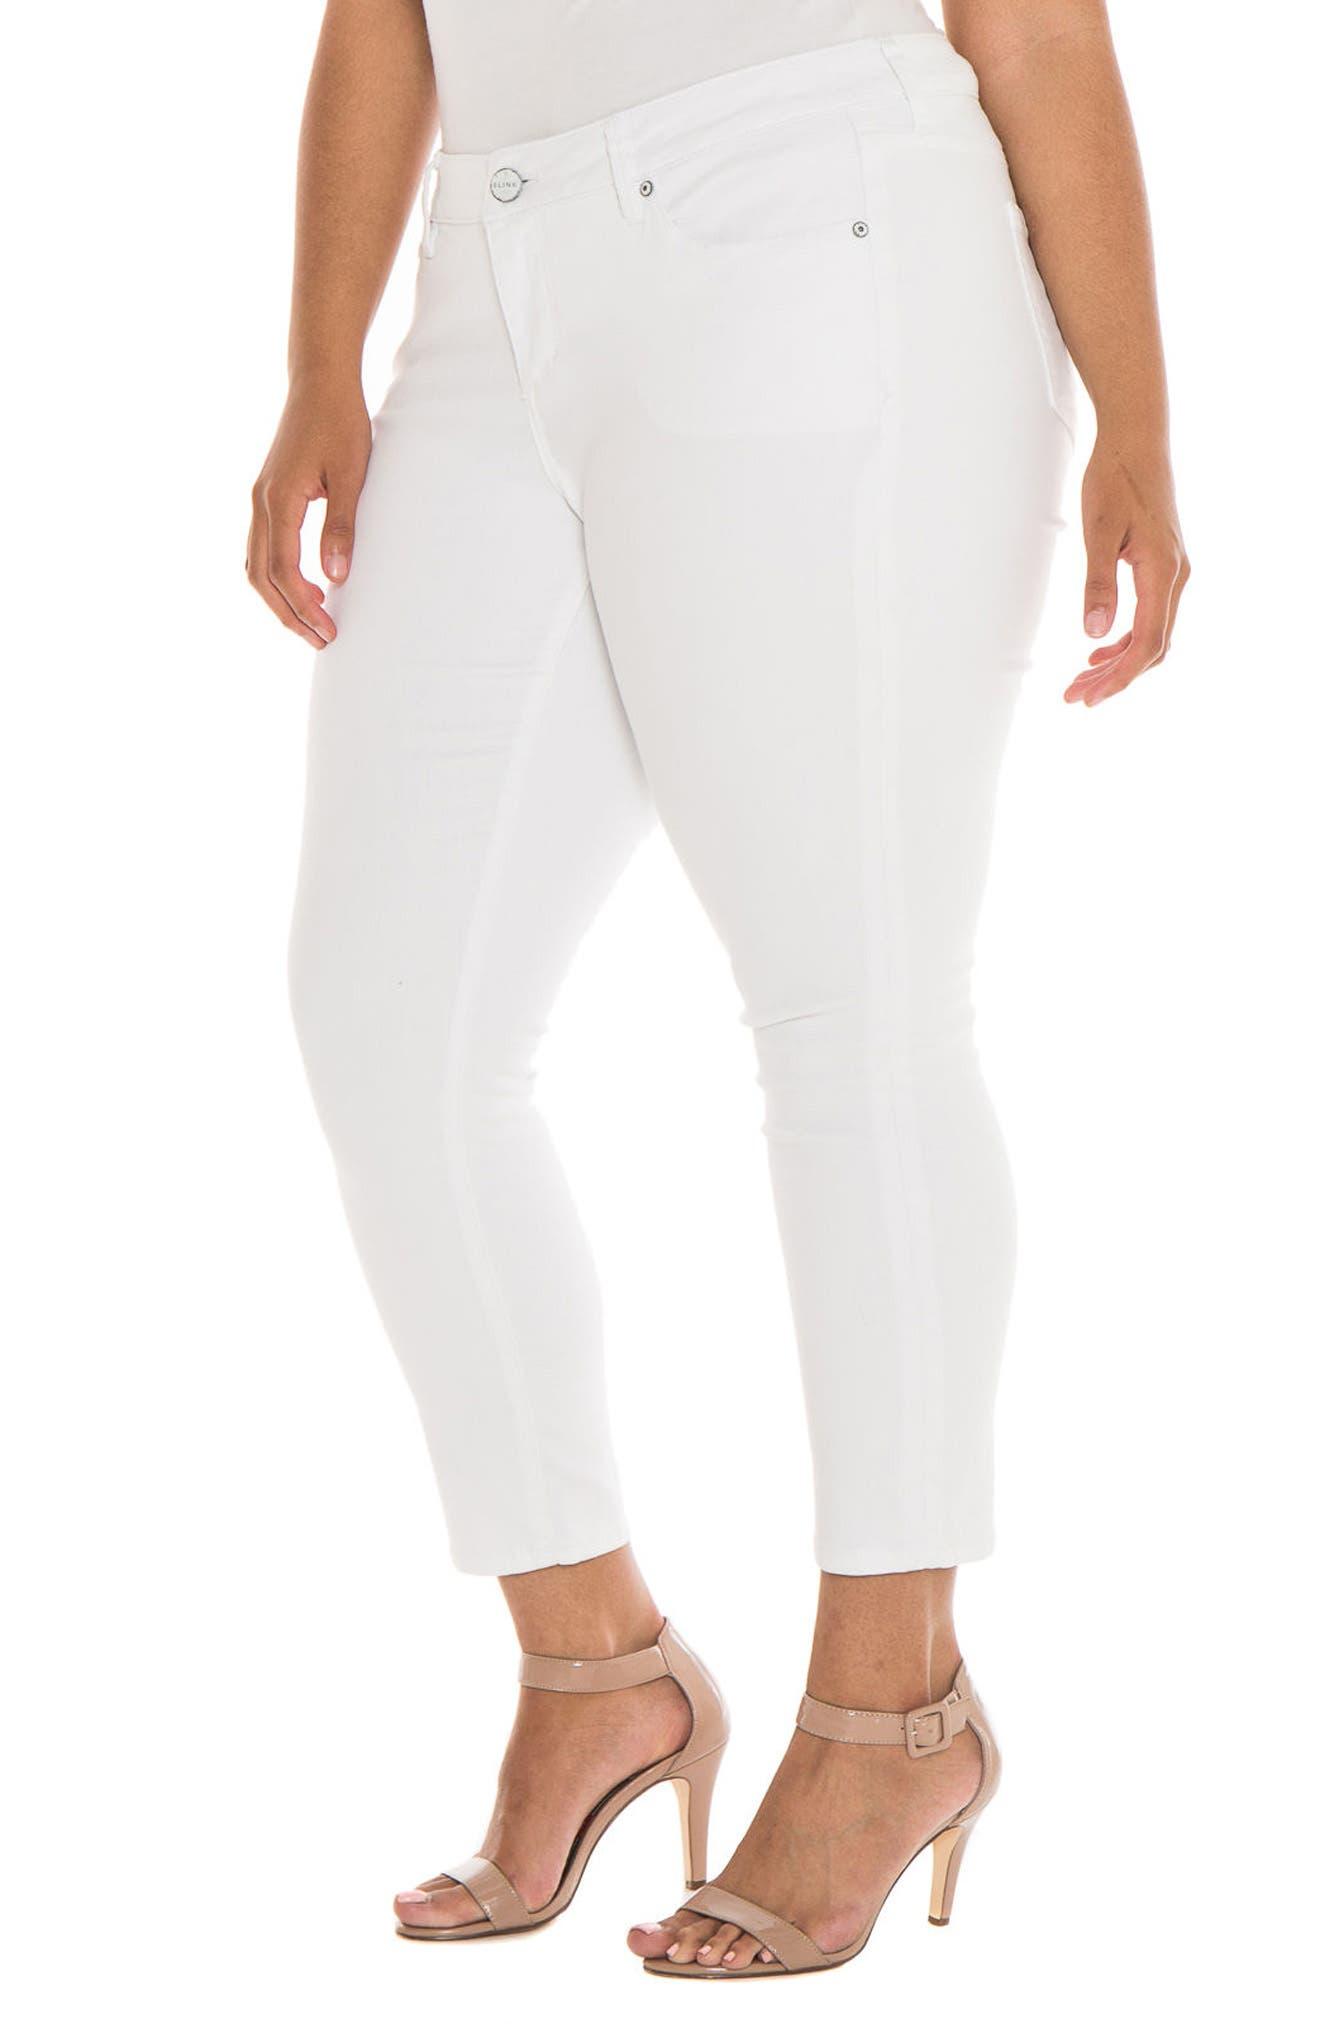 Main Image - SLINK Jeans Stretch Skinny Jeans (Charlie) (Plus Size)